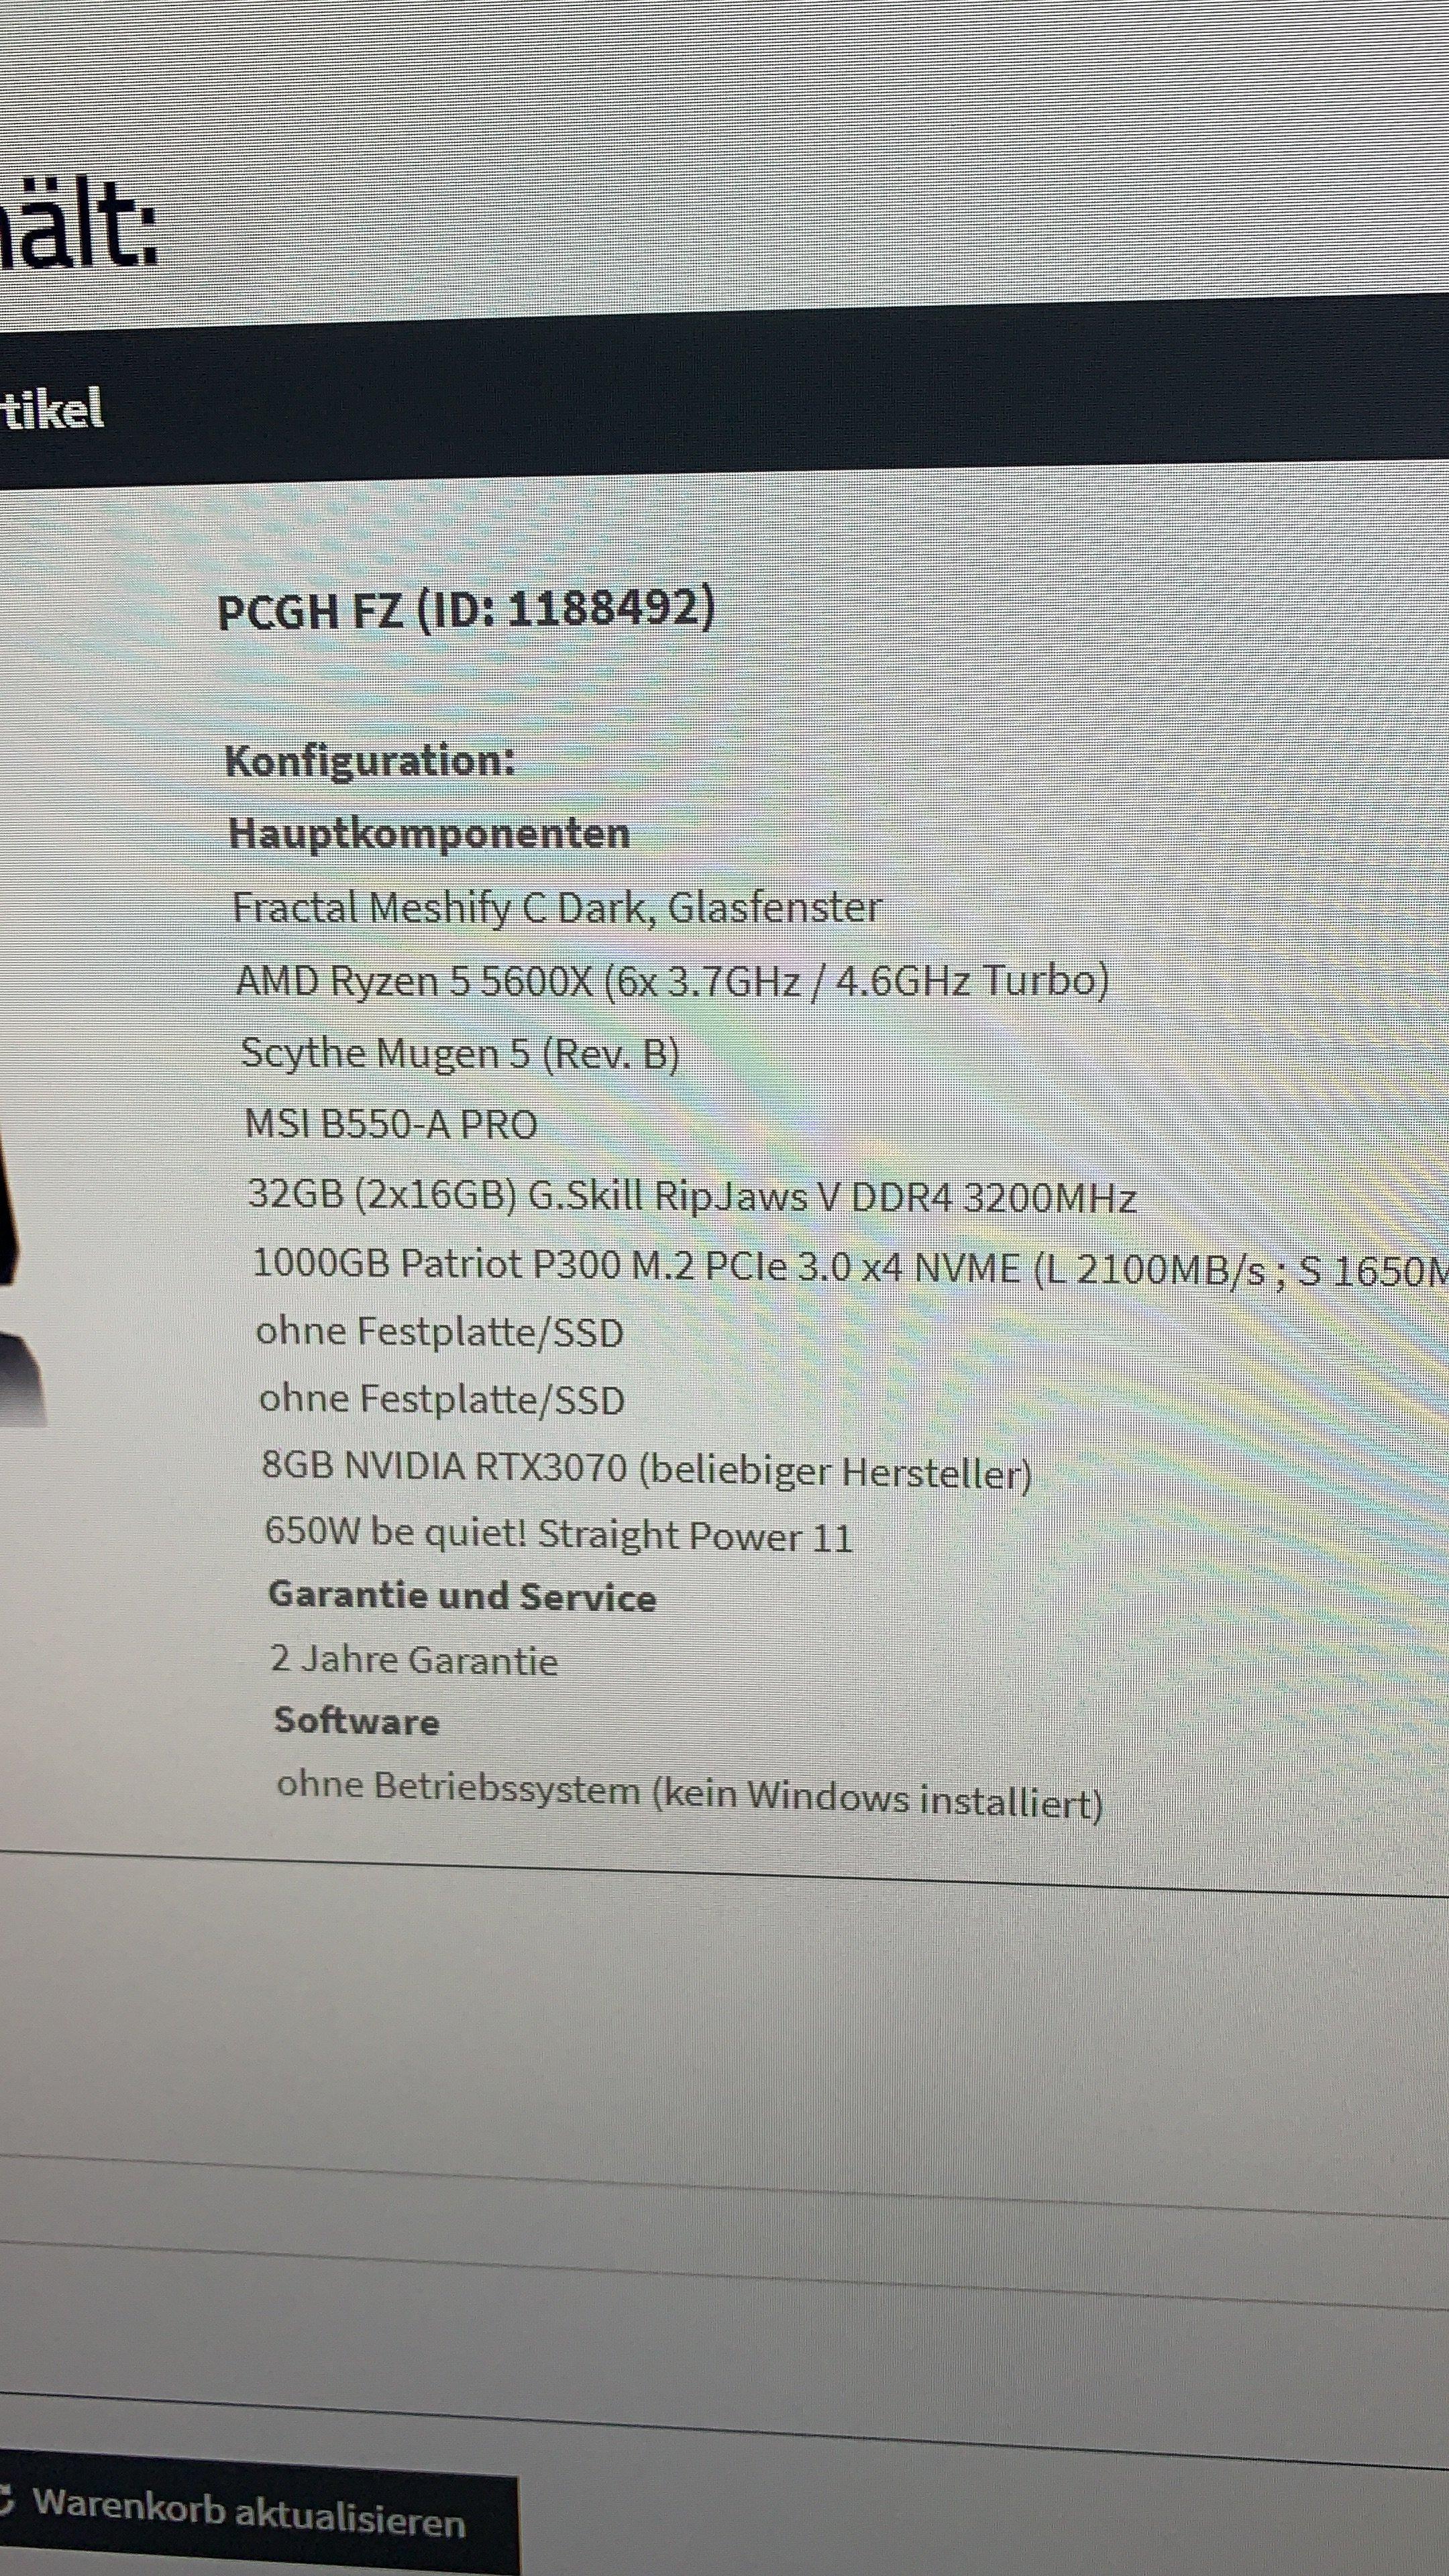 386D907A-35CD-4DBE-B98A-F291373D4442.jpeg